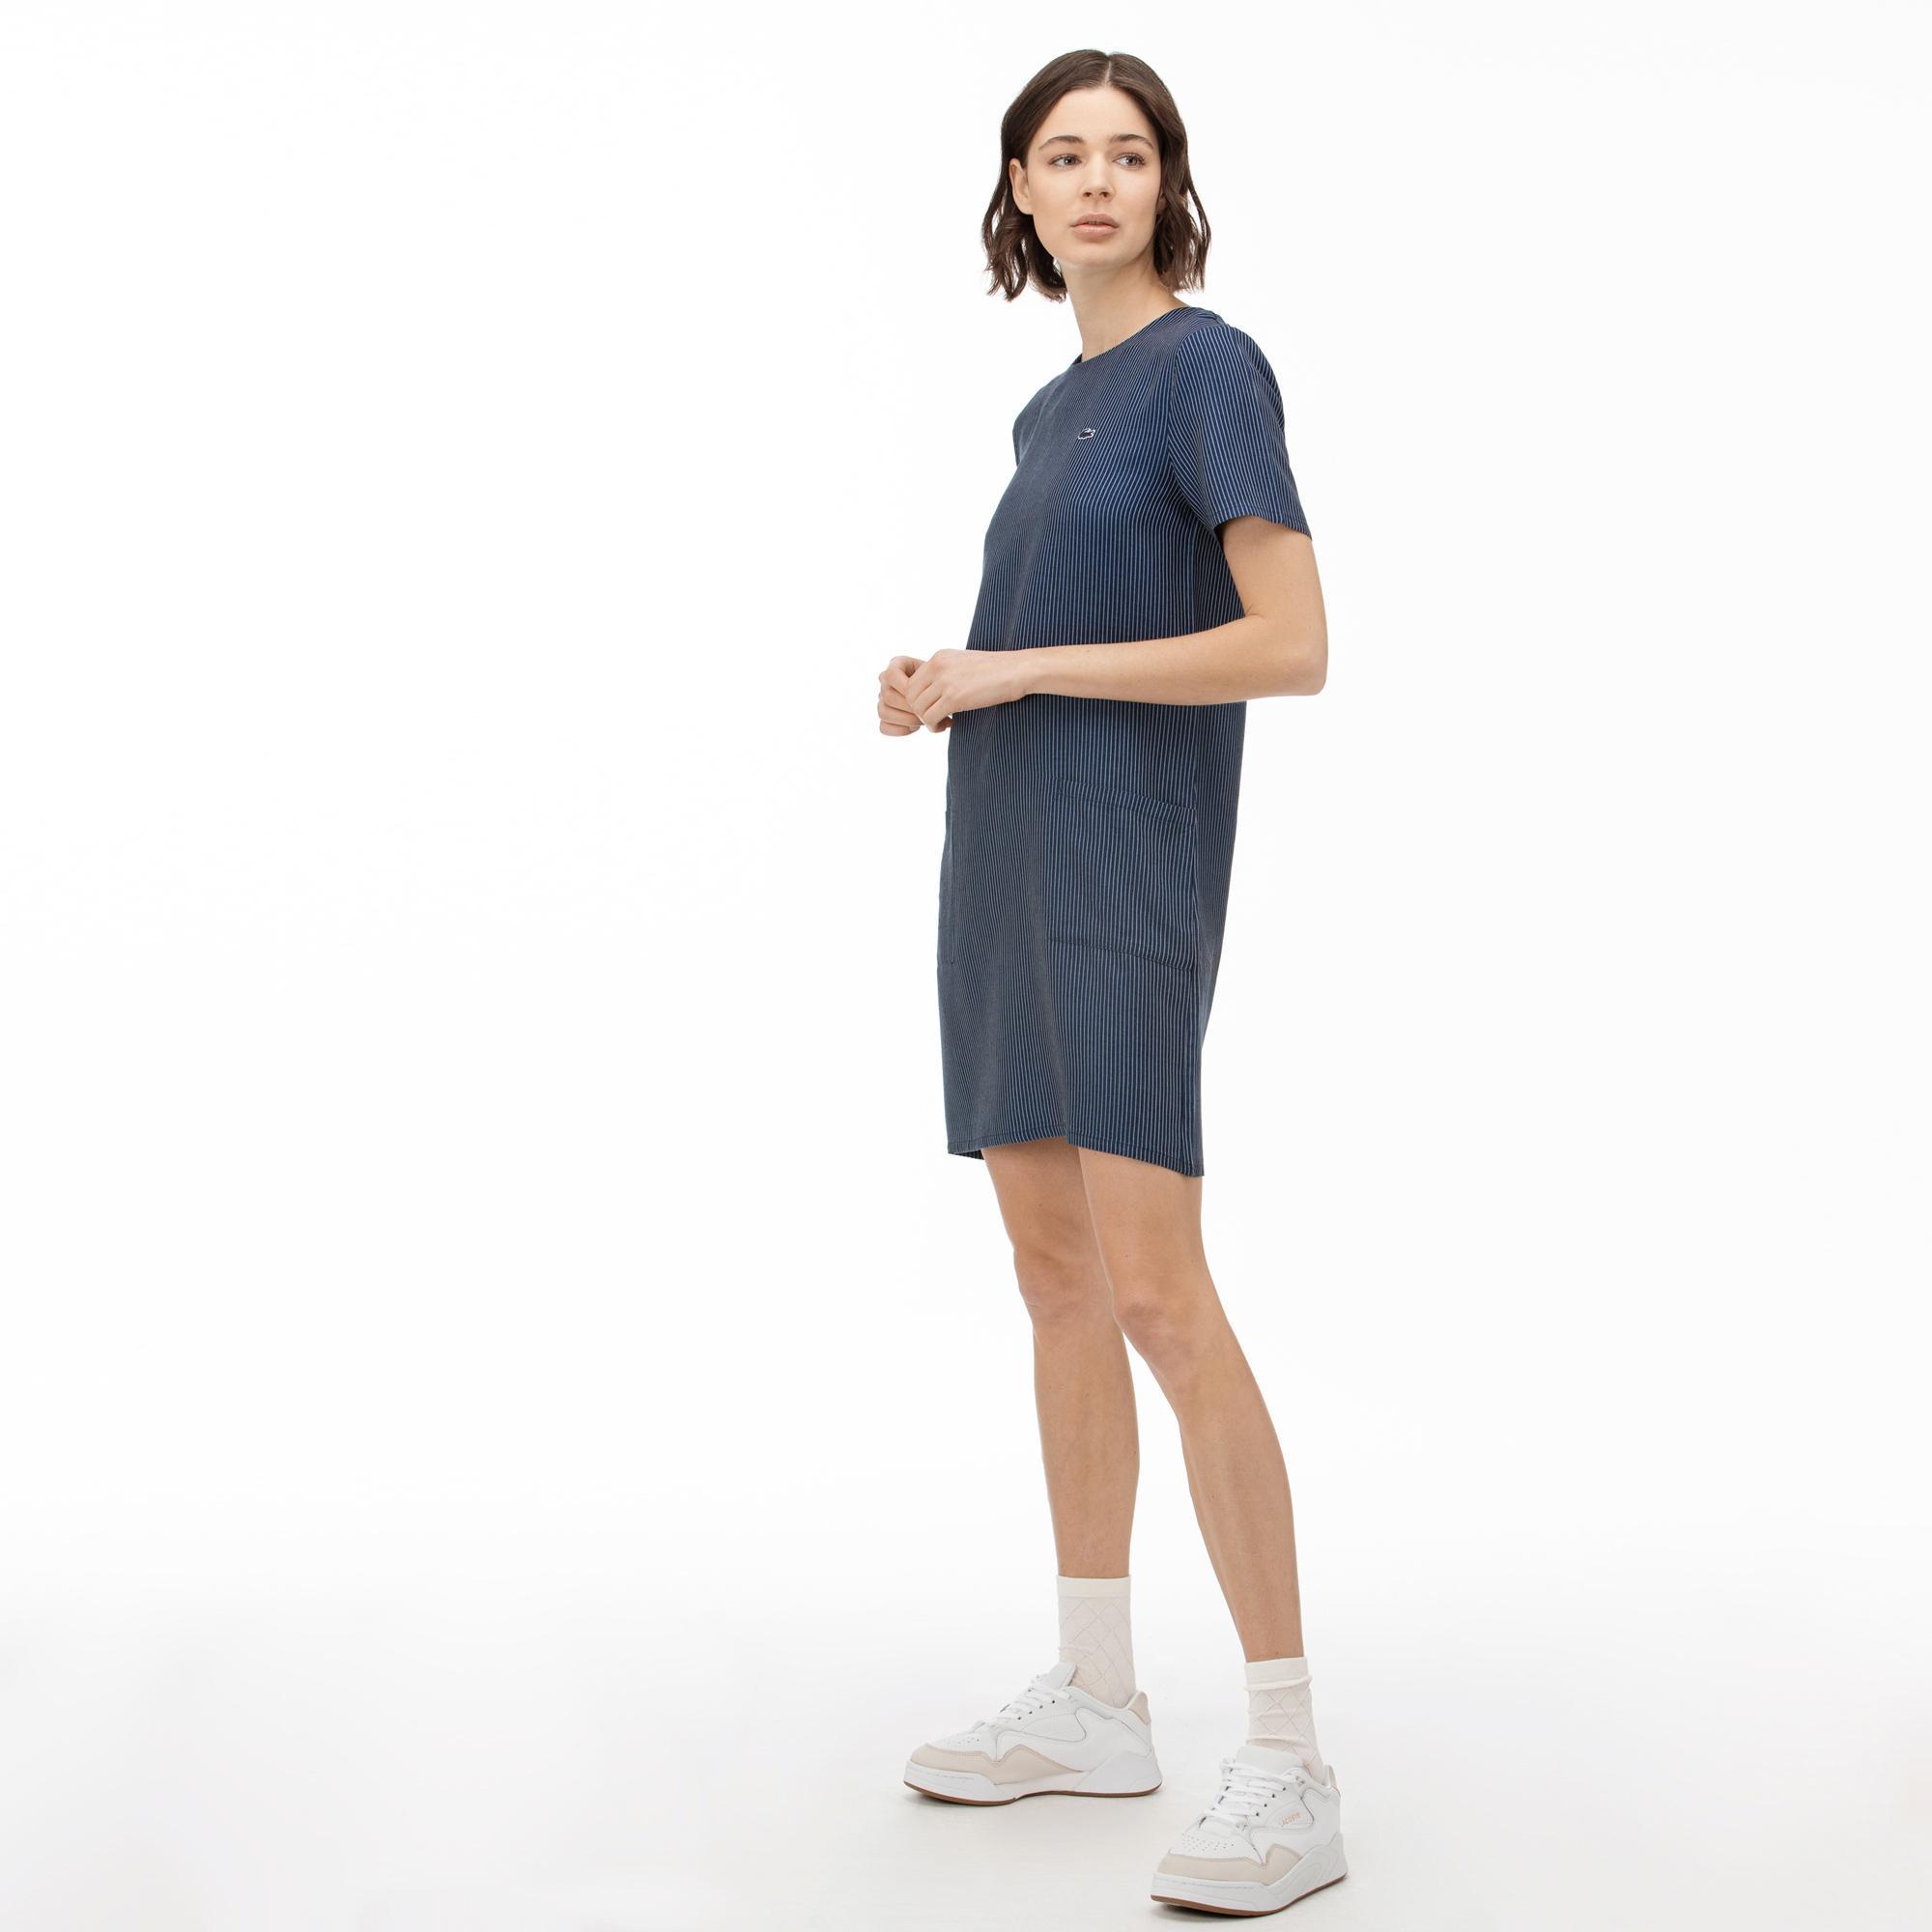 Lacoste Women's Round Neck Striped Short Sleeve Dress